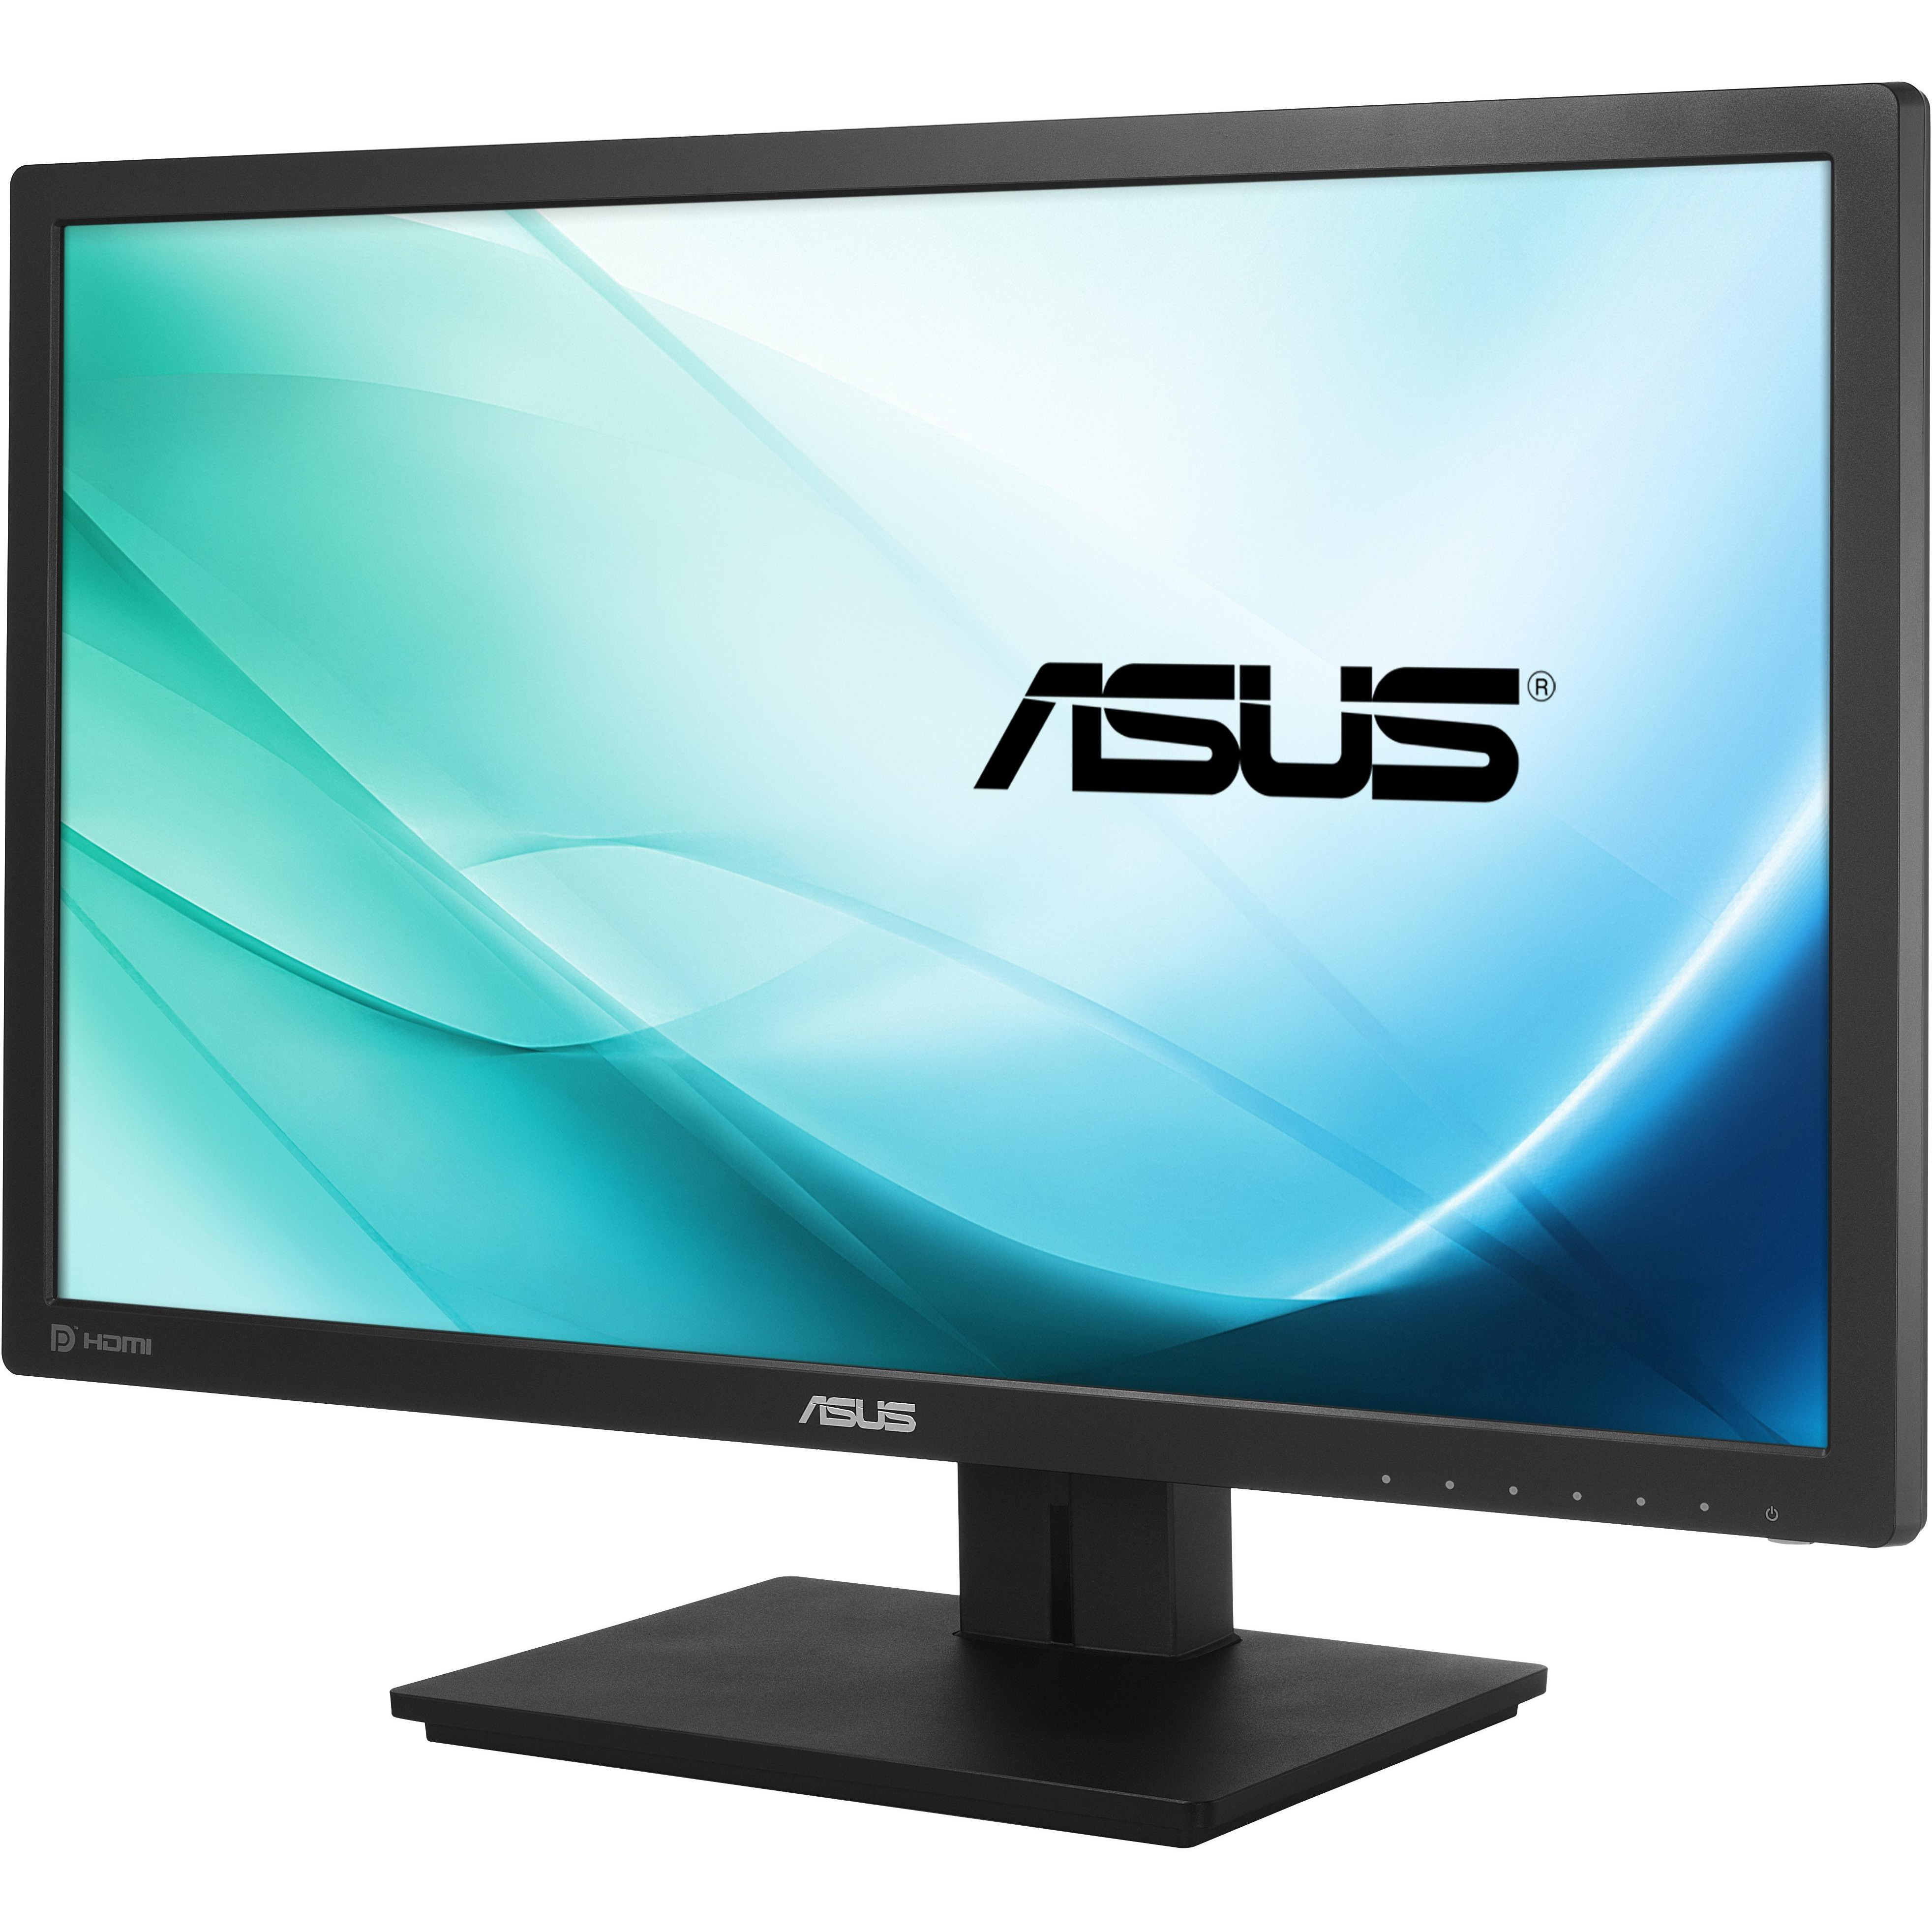 Asus PB278QR  27inch LED LCD Monitor - 16:9 - 5 ms - WQHD